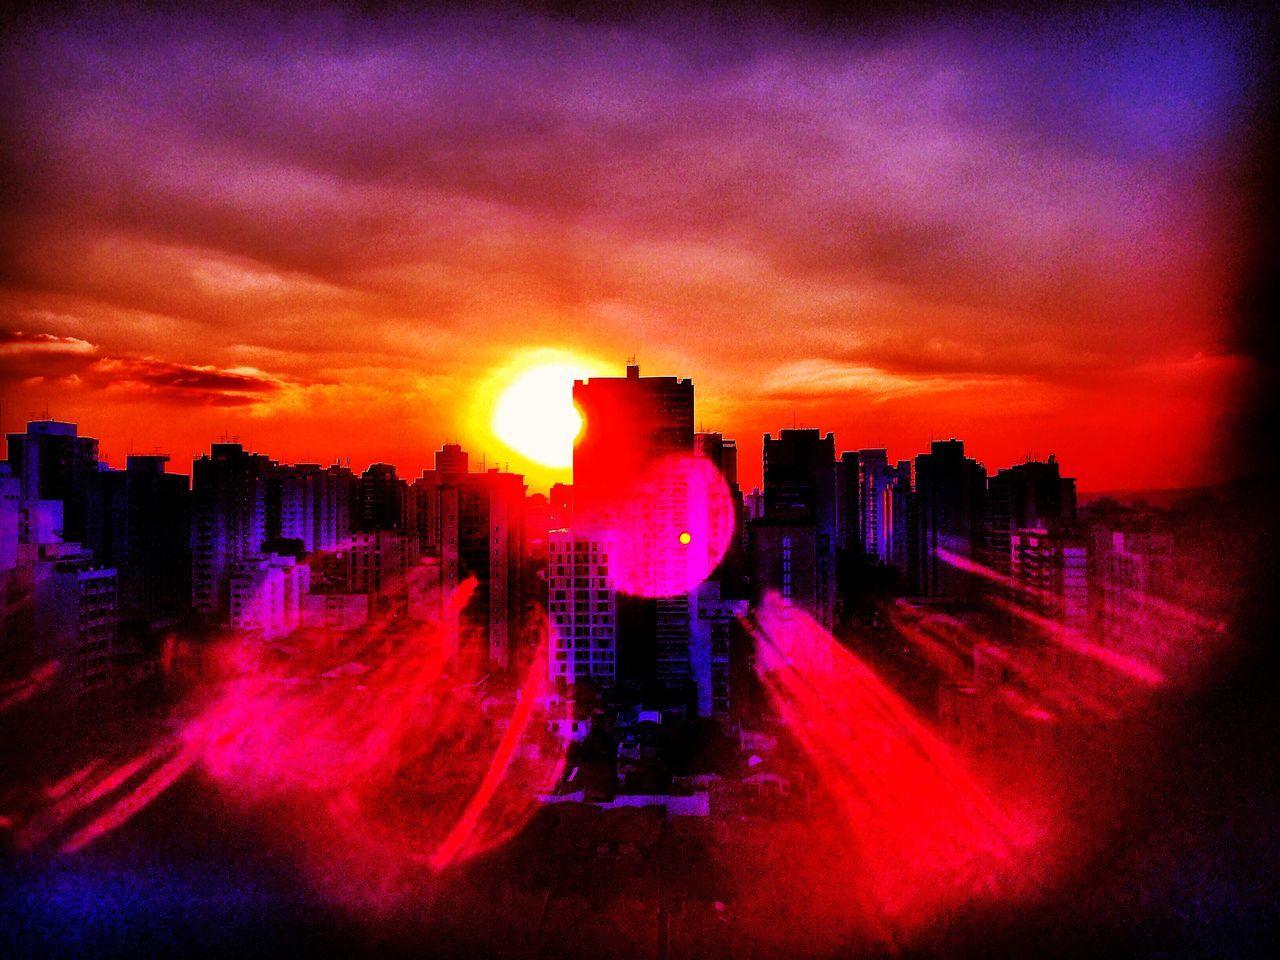 SAO PAULO BRAZIL AUTUMN Beauty In Nature City City City Life Cloud Cloud - Sky Dramatic Sky EyeEm Team Glowing Illuminated Lens Flare Modern Multi Colored Nature No People Orange Color Outdoors Scenics Sky Sun Sunbeam Sunset Urban